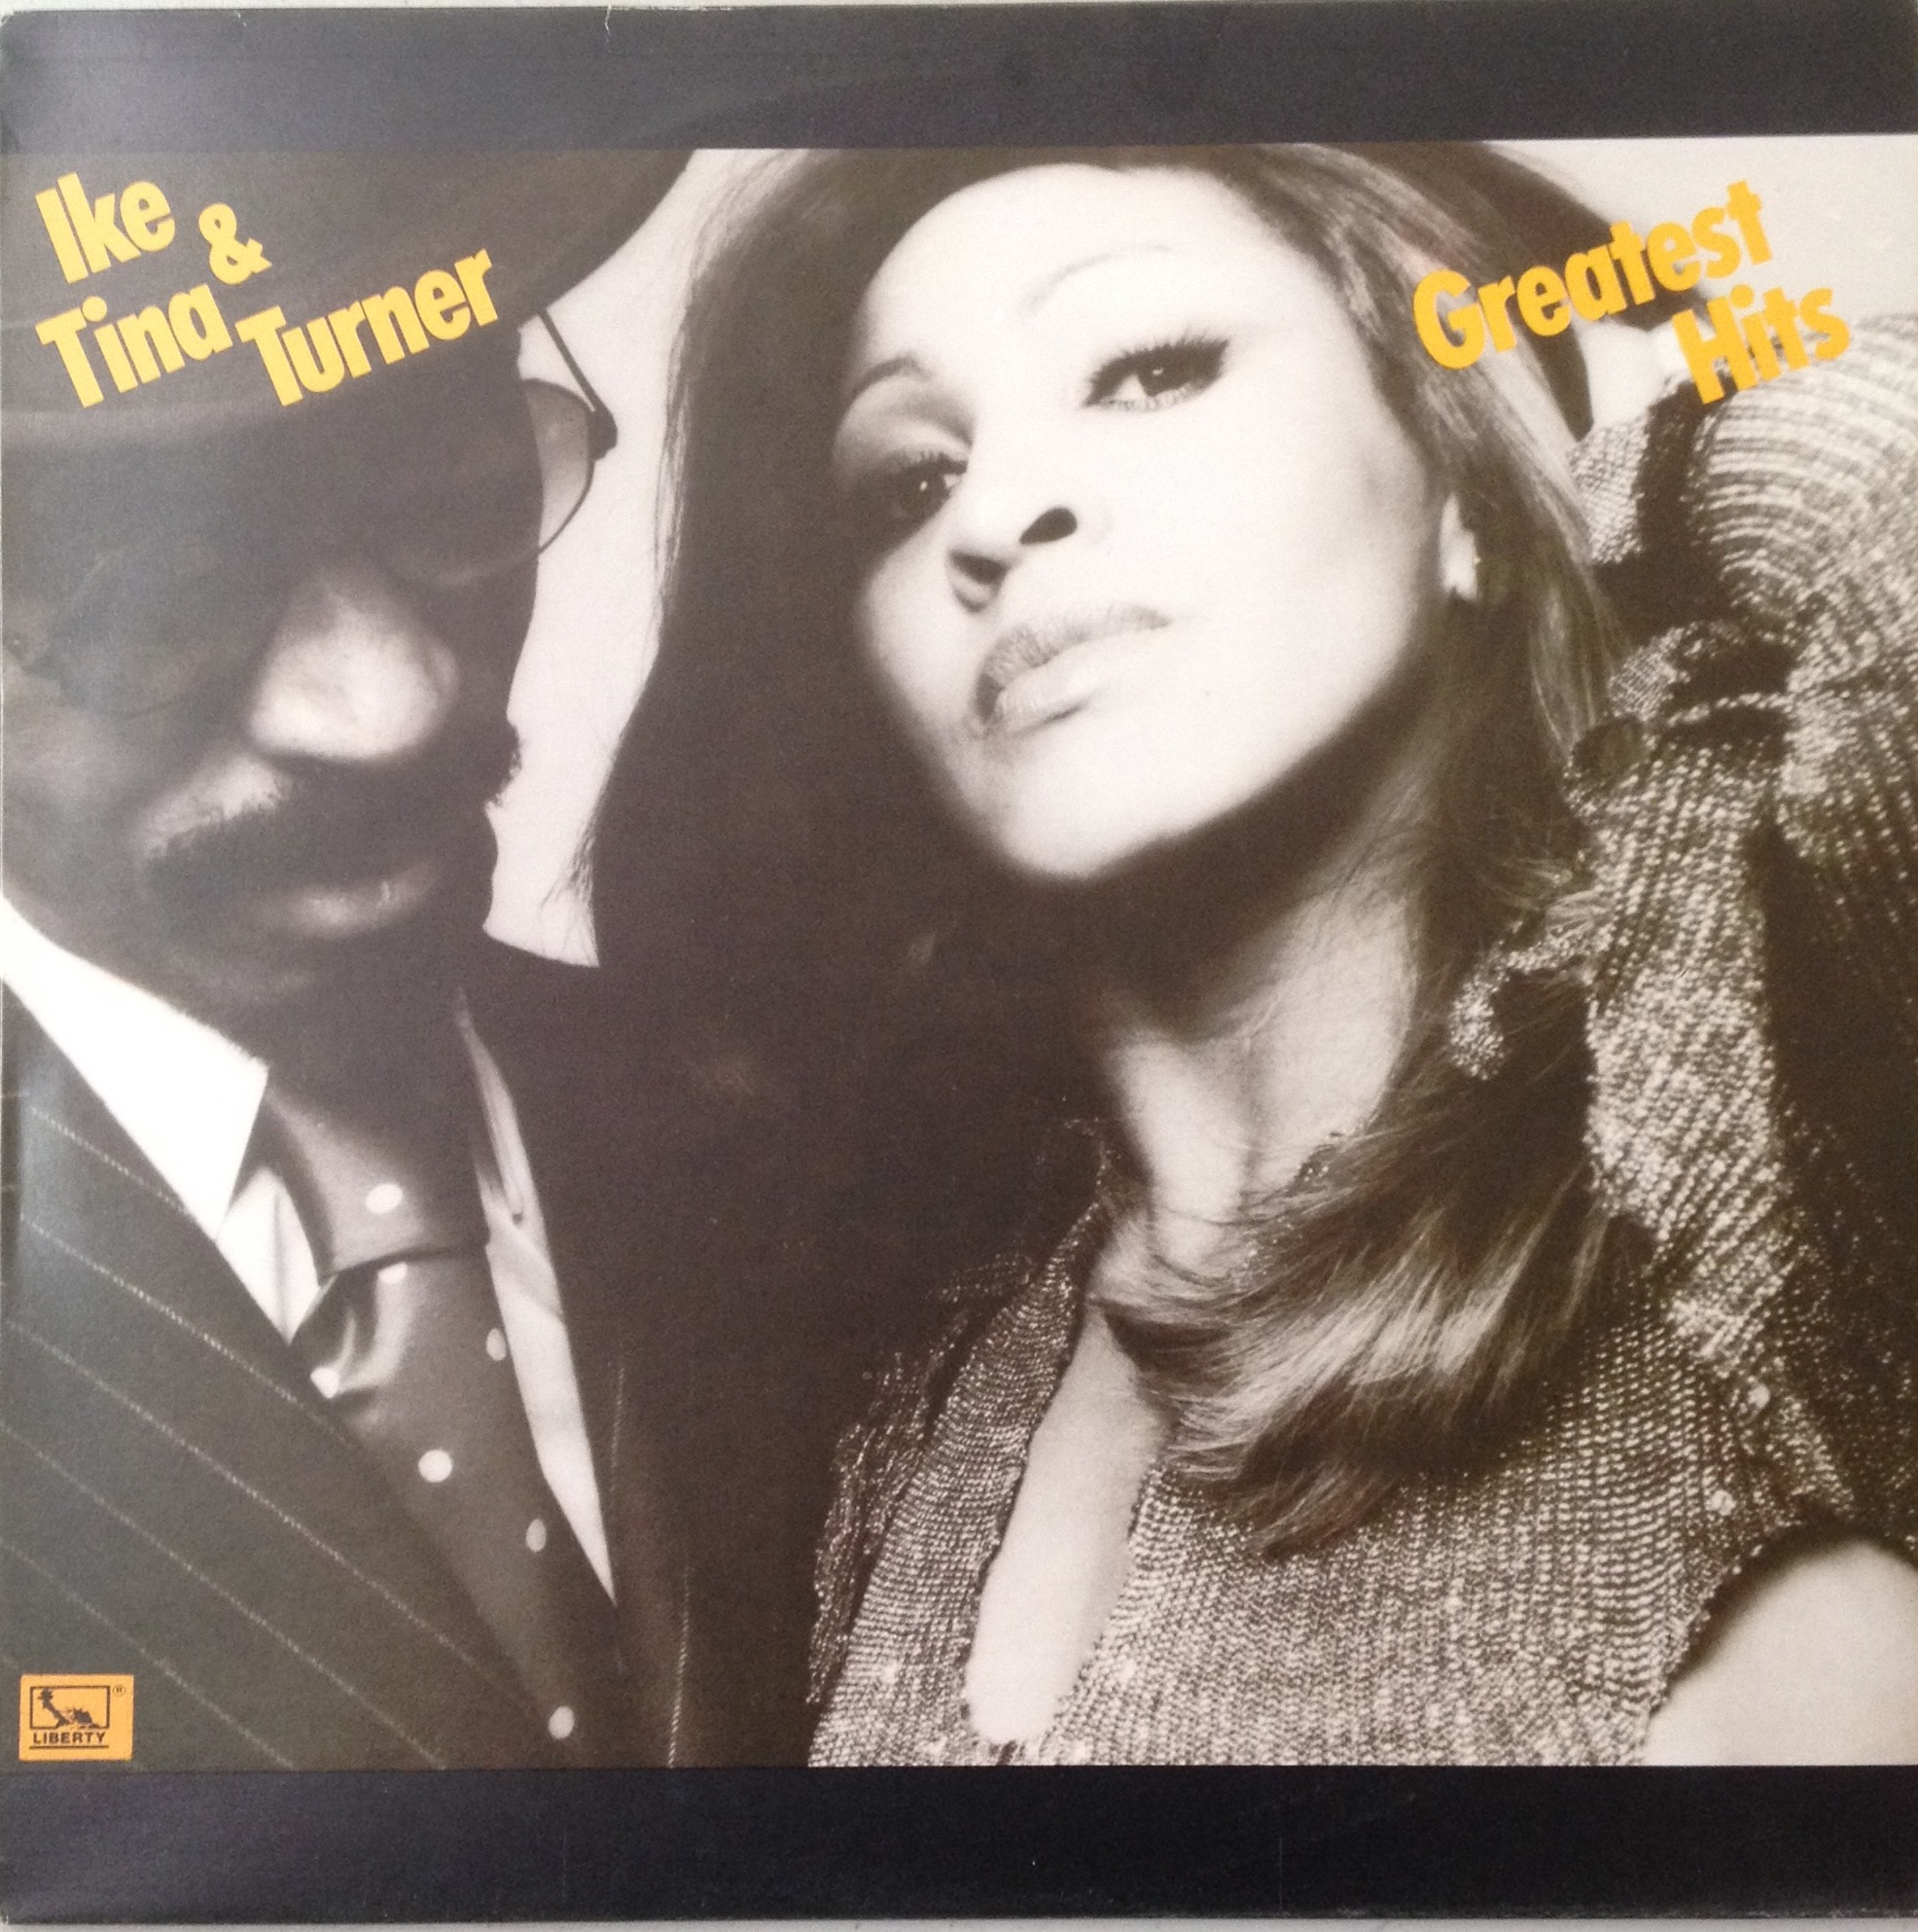 Ike & Tina Turner/GREATEST HITS LP